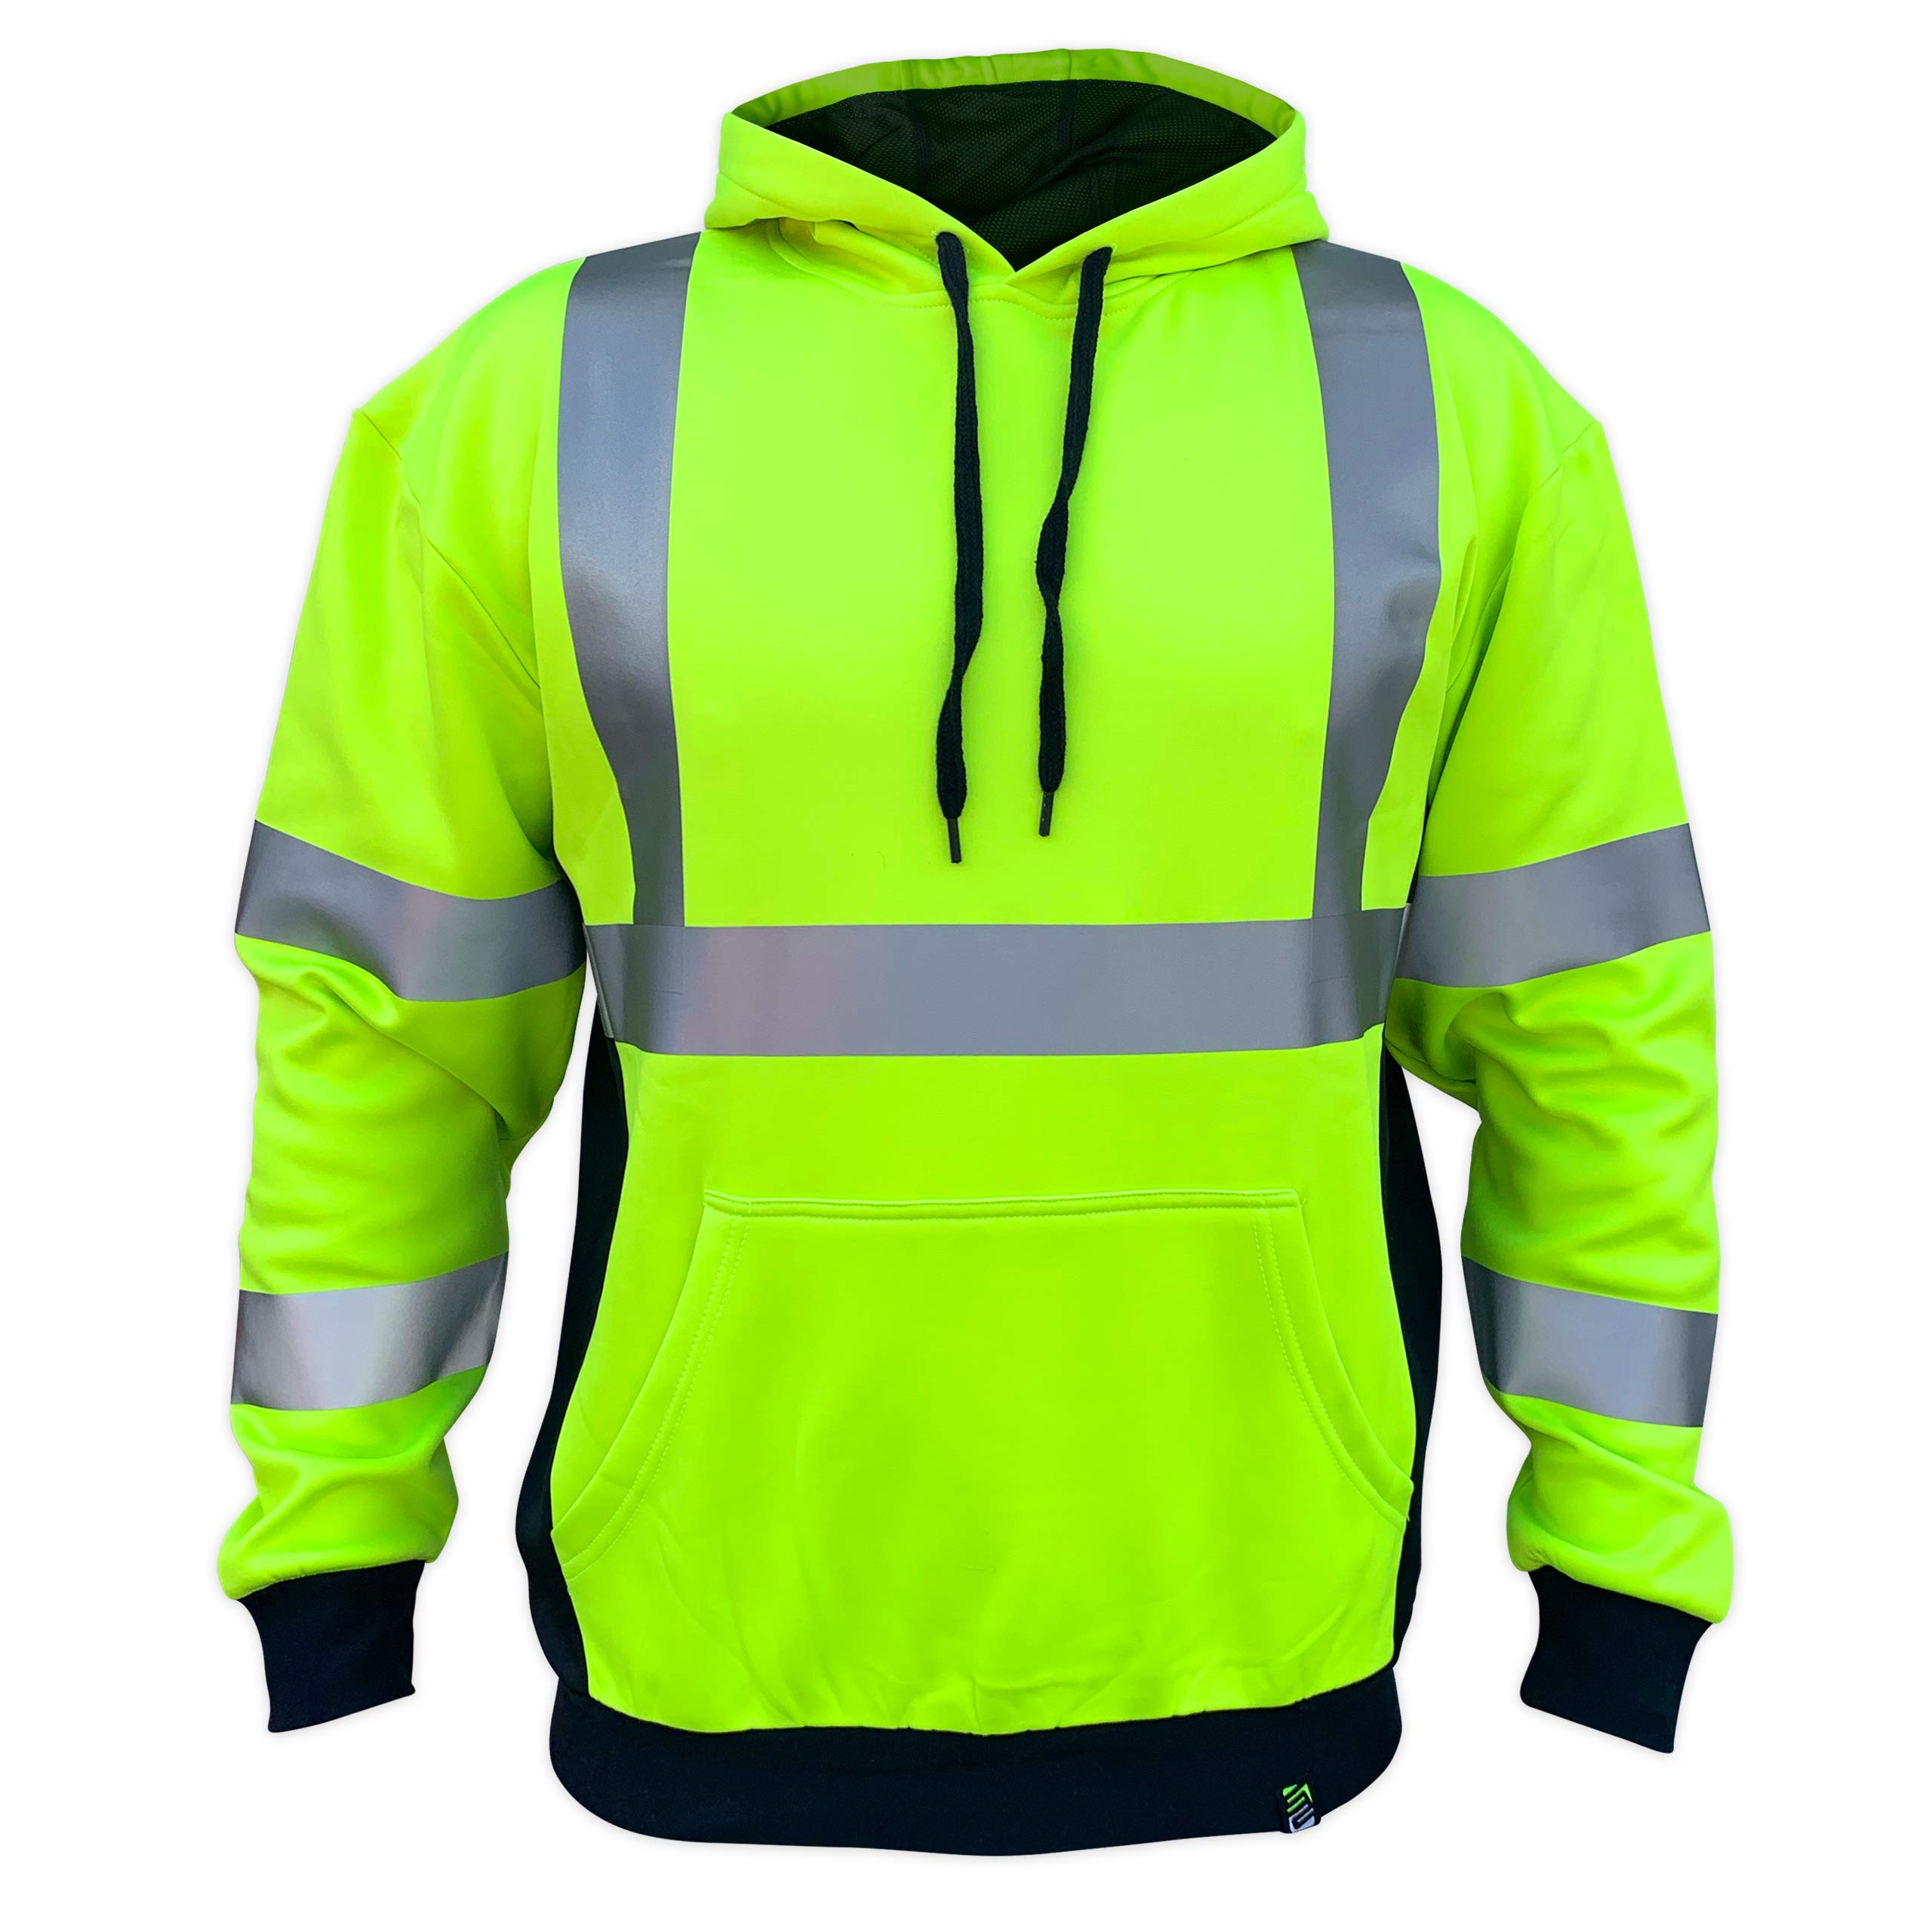 SafetyShirtz SS360 ANSI Class 3 Safety Hoodie Yellow (Safety Green) M by SafetyShirtz